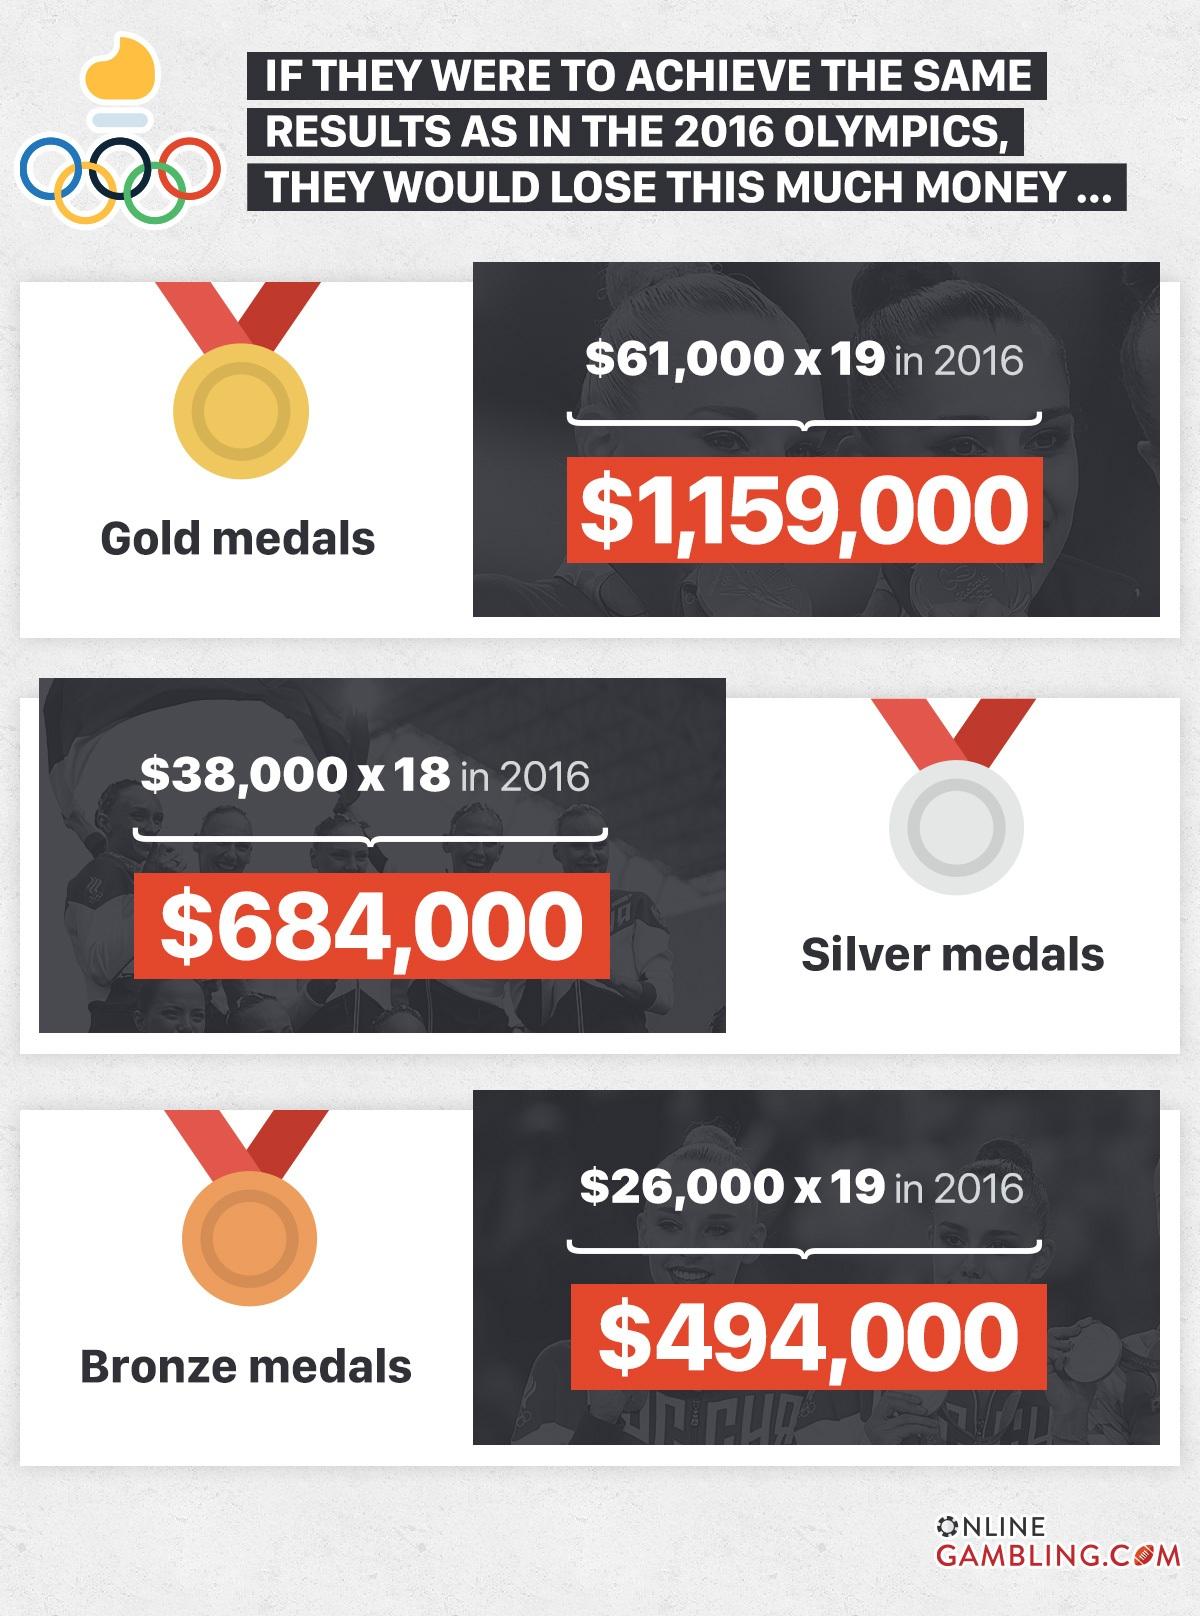 Money Russian Athletes will lose